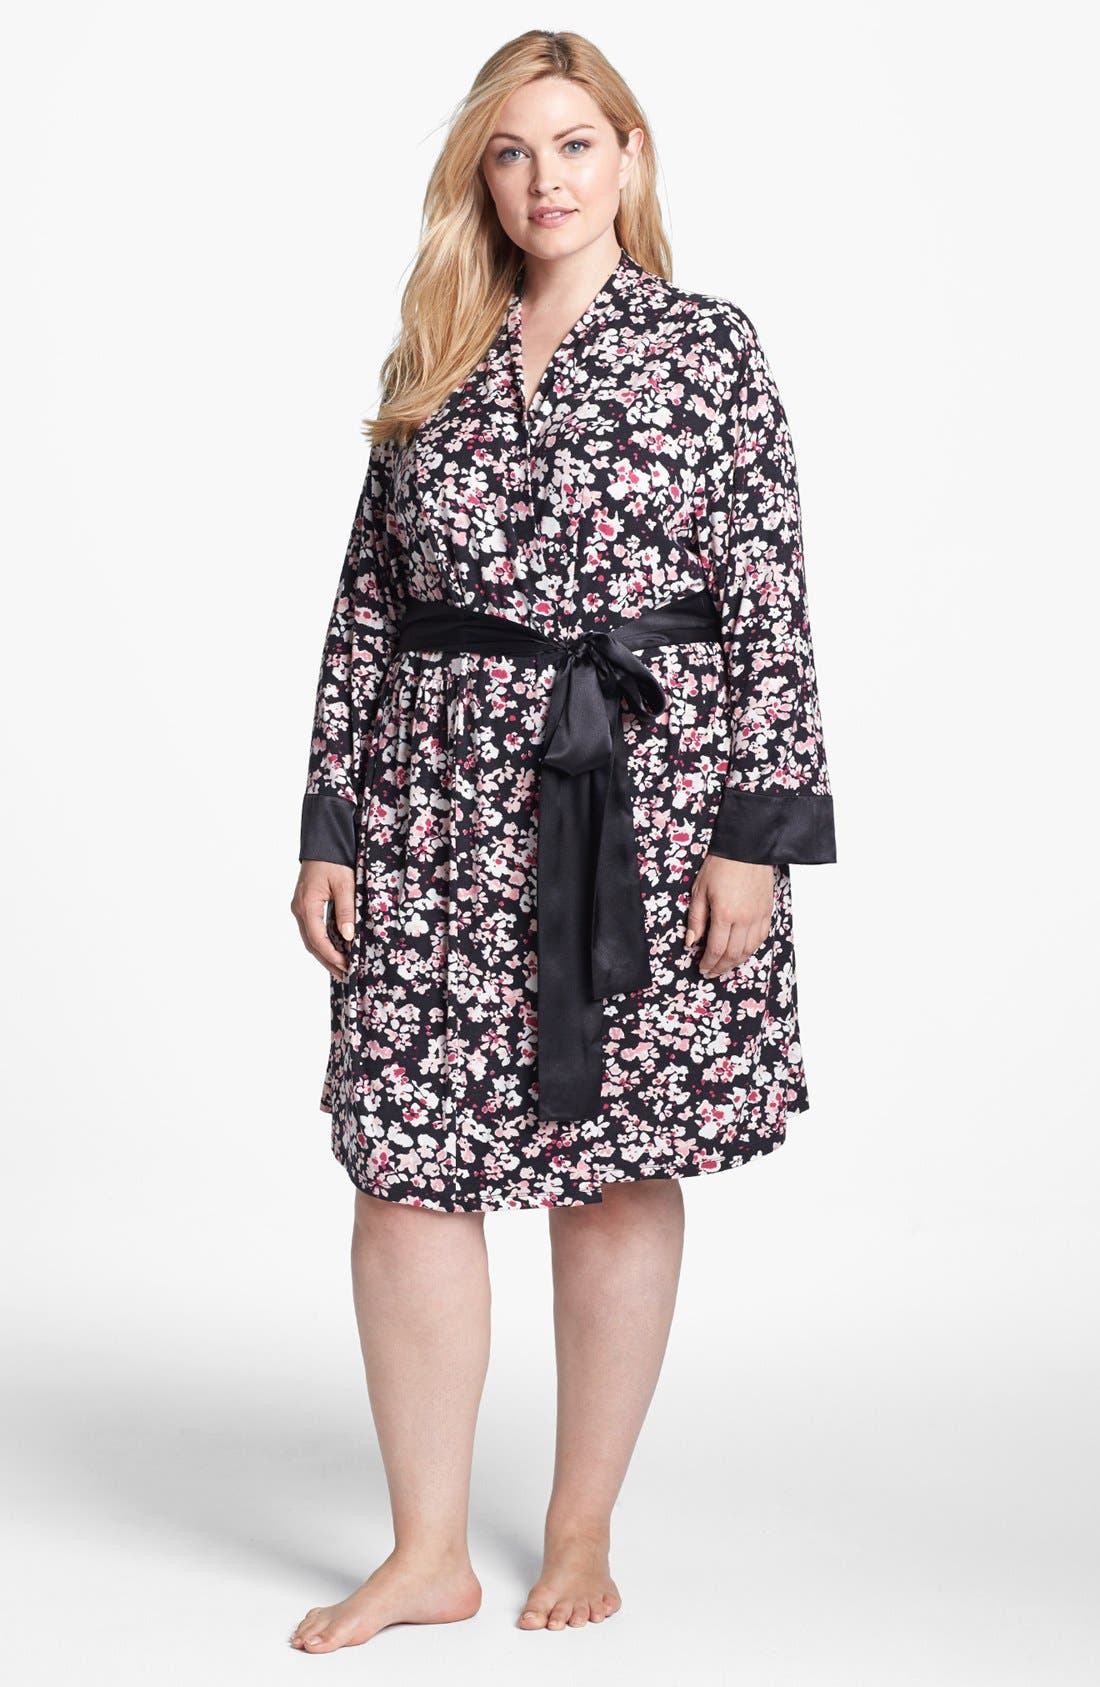 Alternate Image 1 Selected - Midnight by Carole Hochman 'Dream Weaver' Robe (Plus Size)